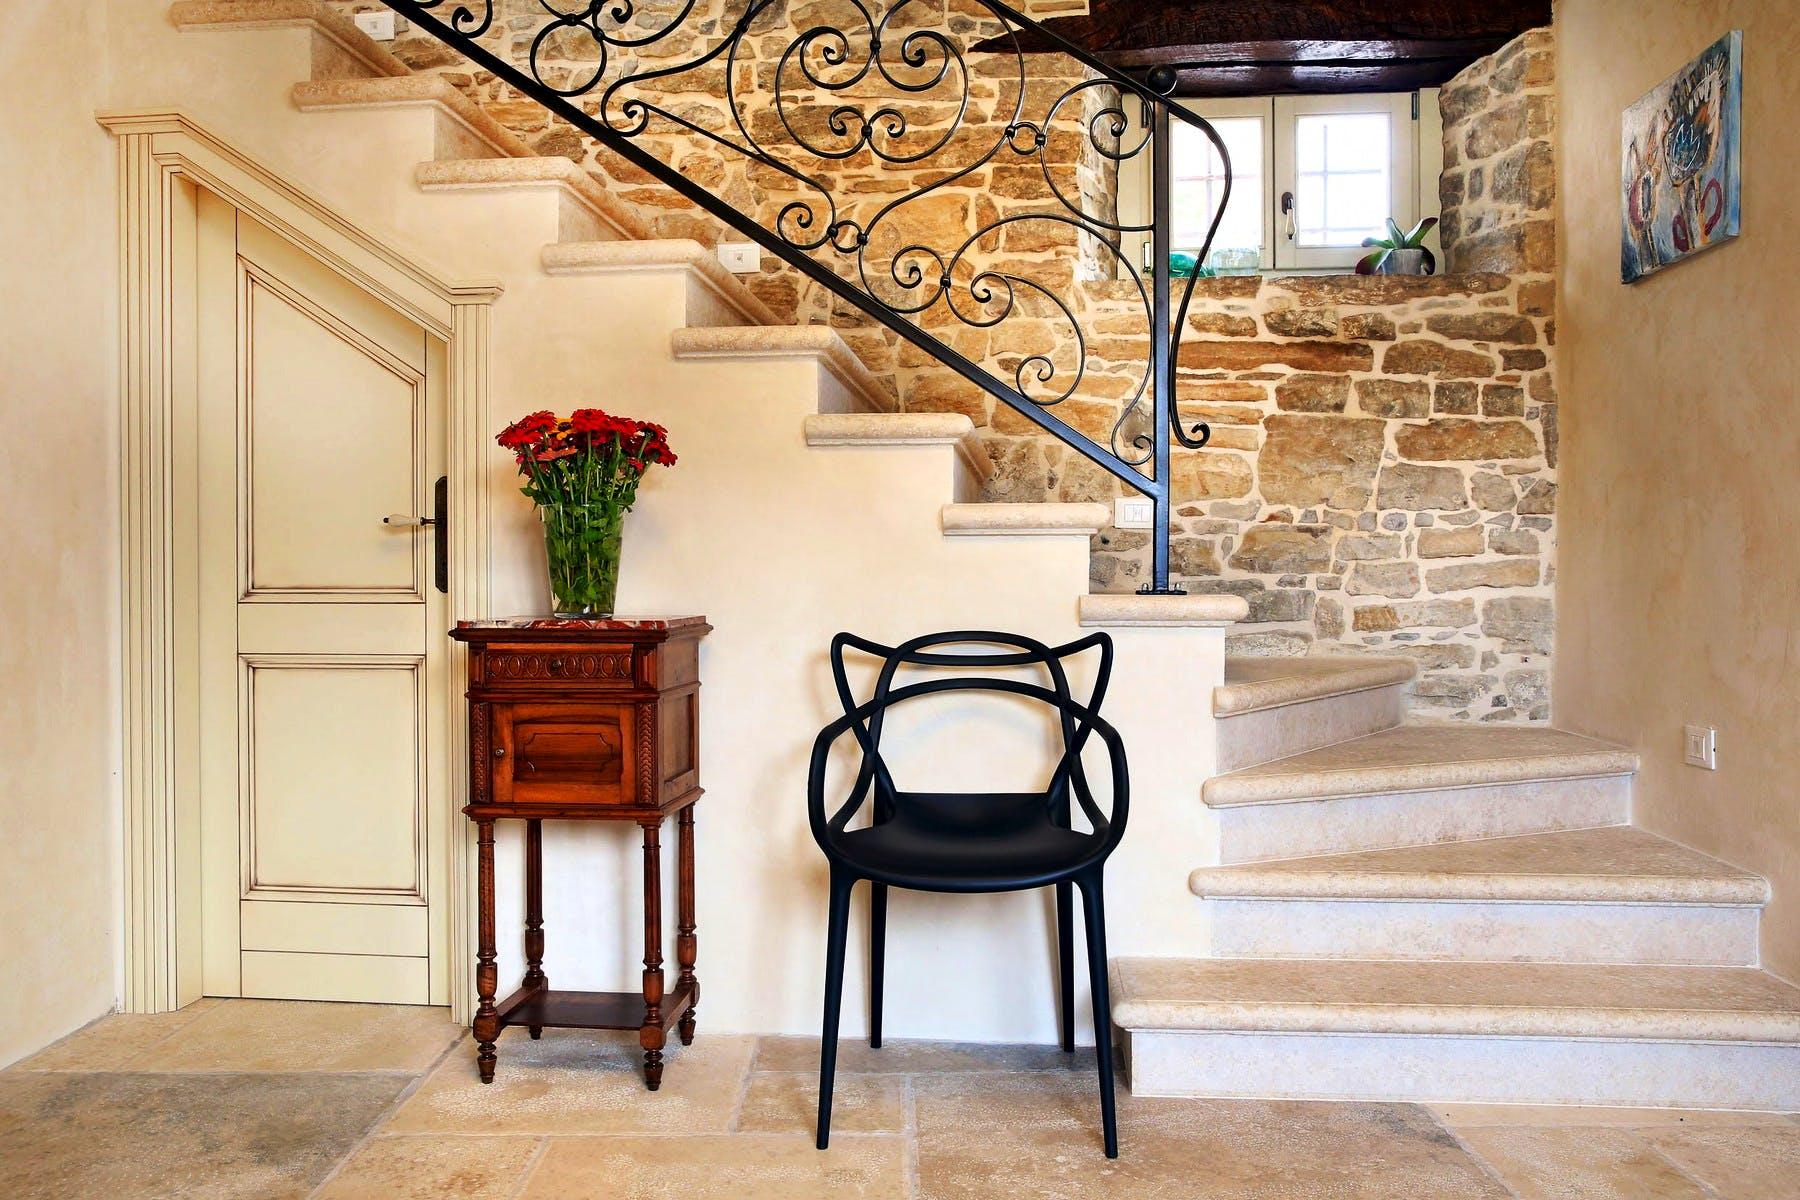 Traditional interior design details